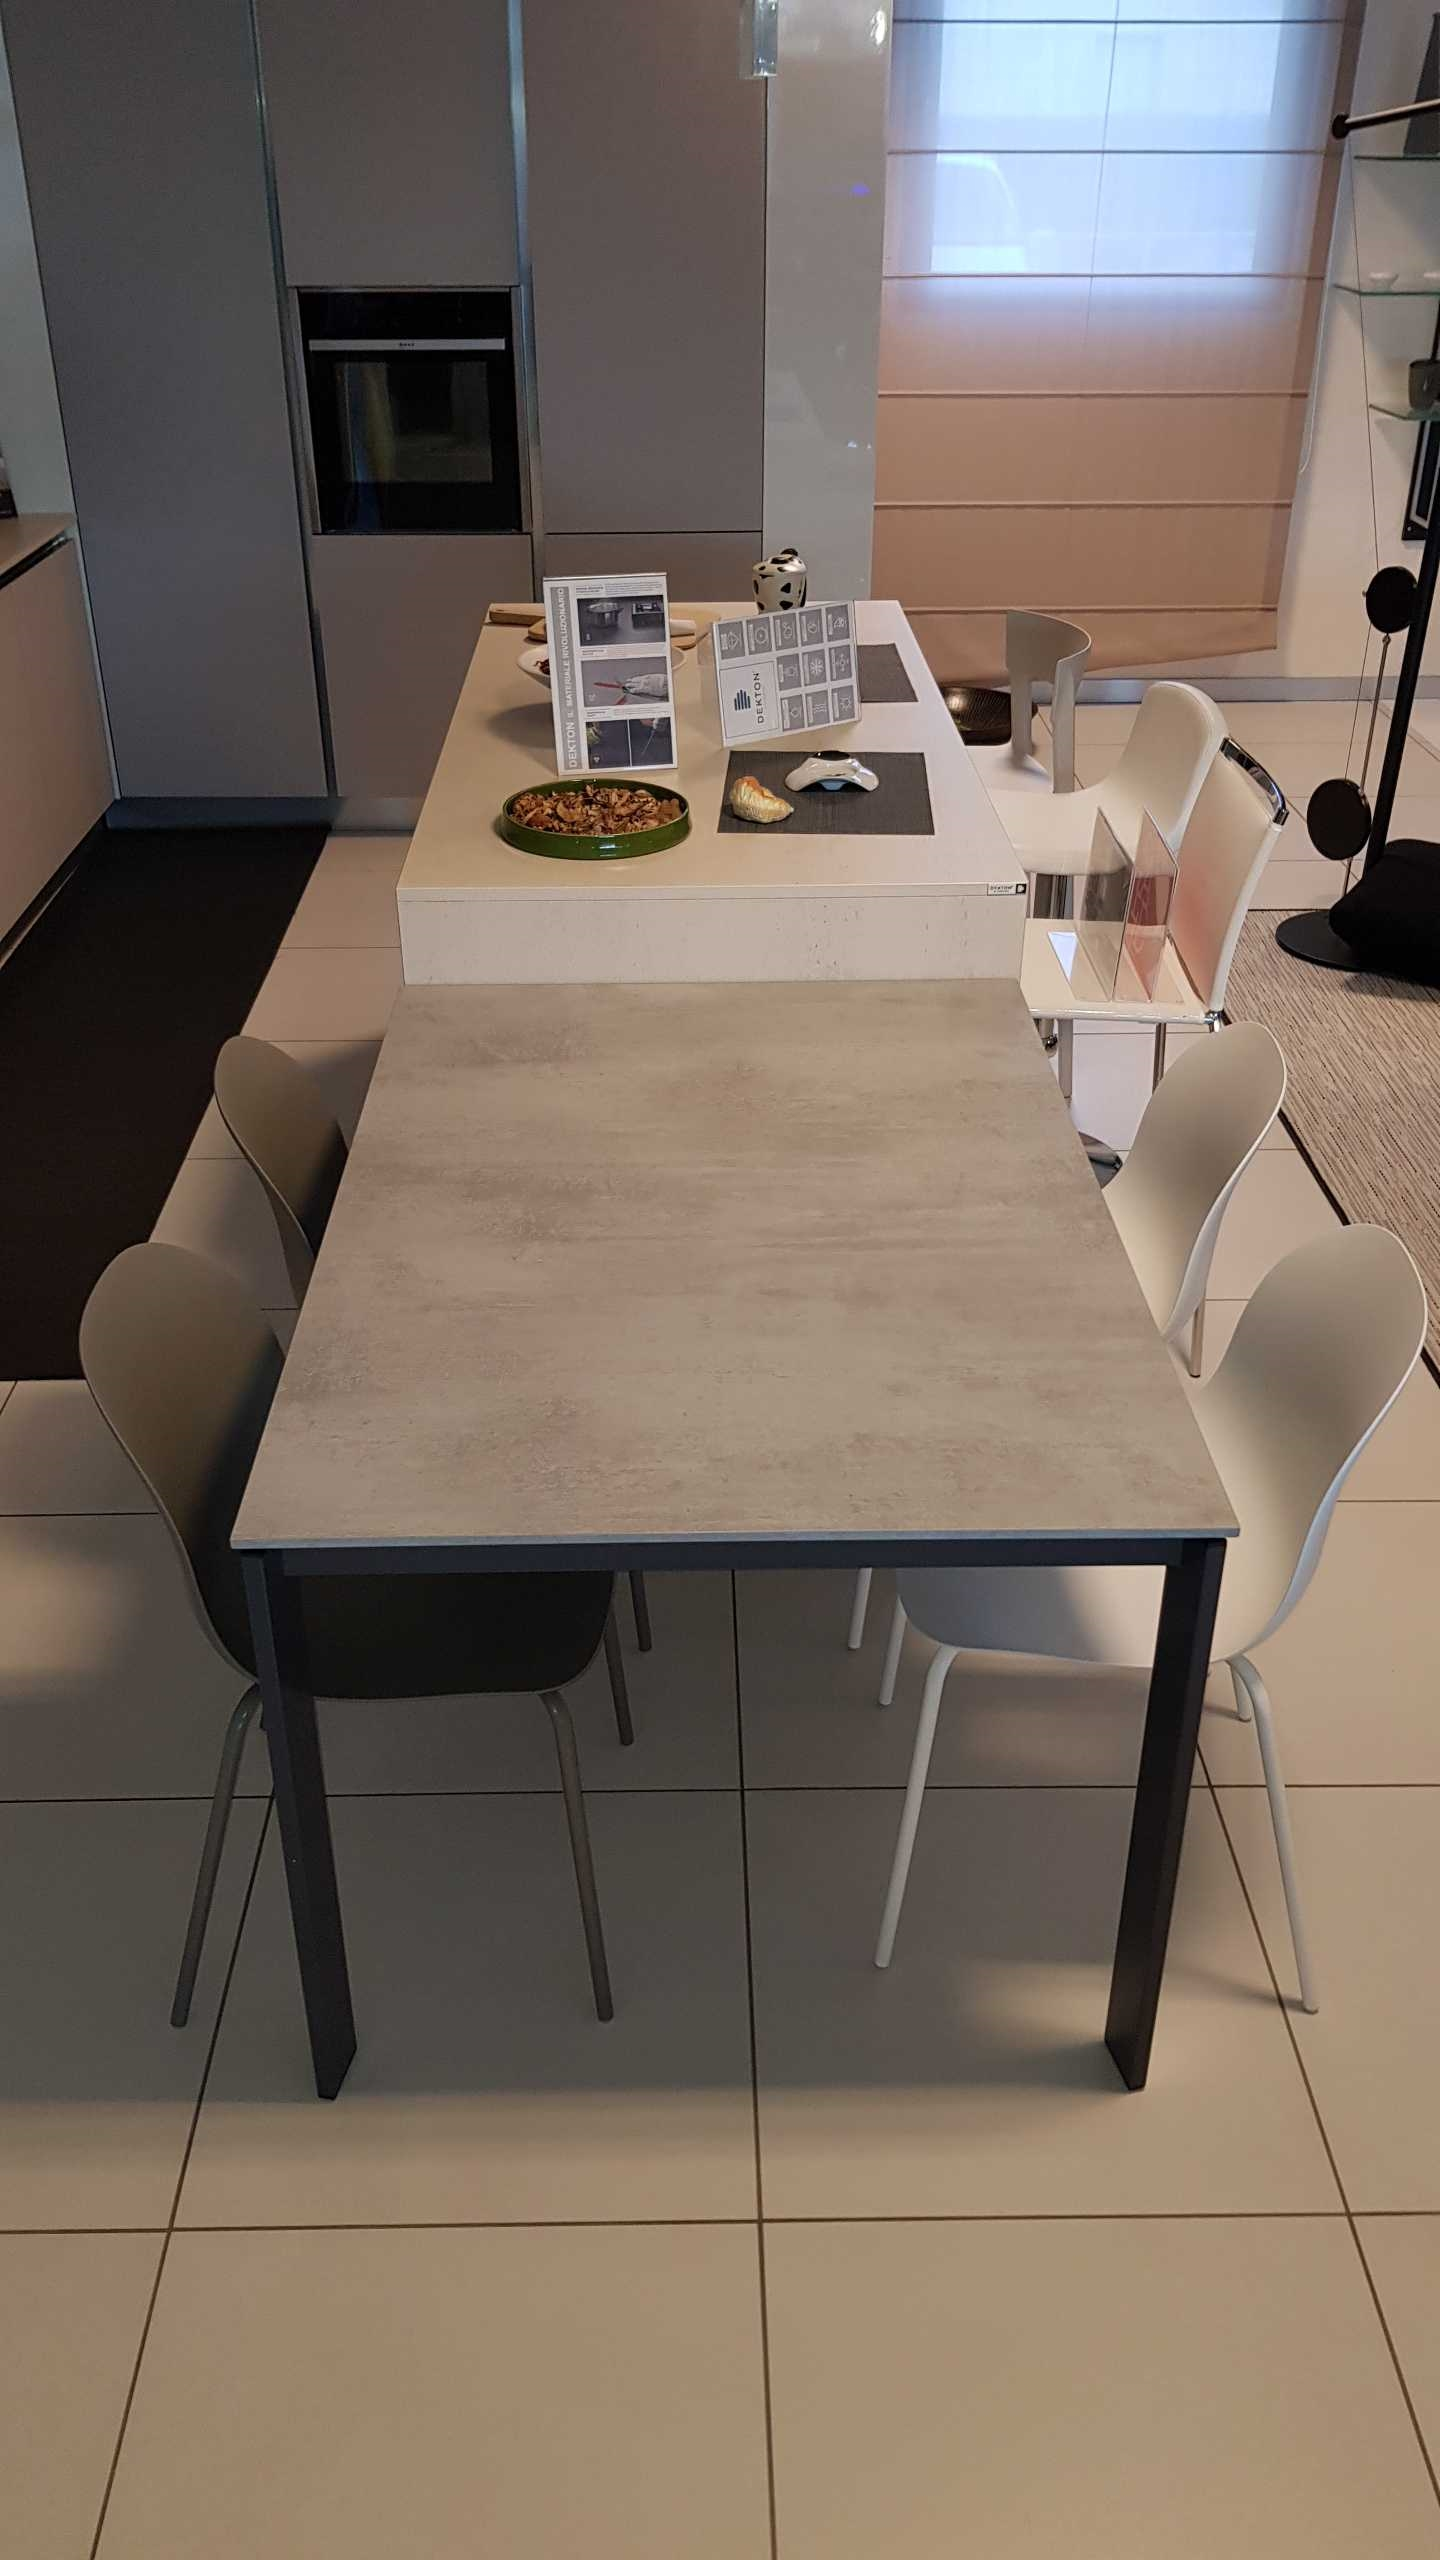 Outlet tavolo calligaris eminence tavoli a prezzi scontati for Tavolo eminence